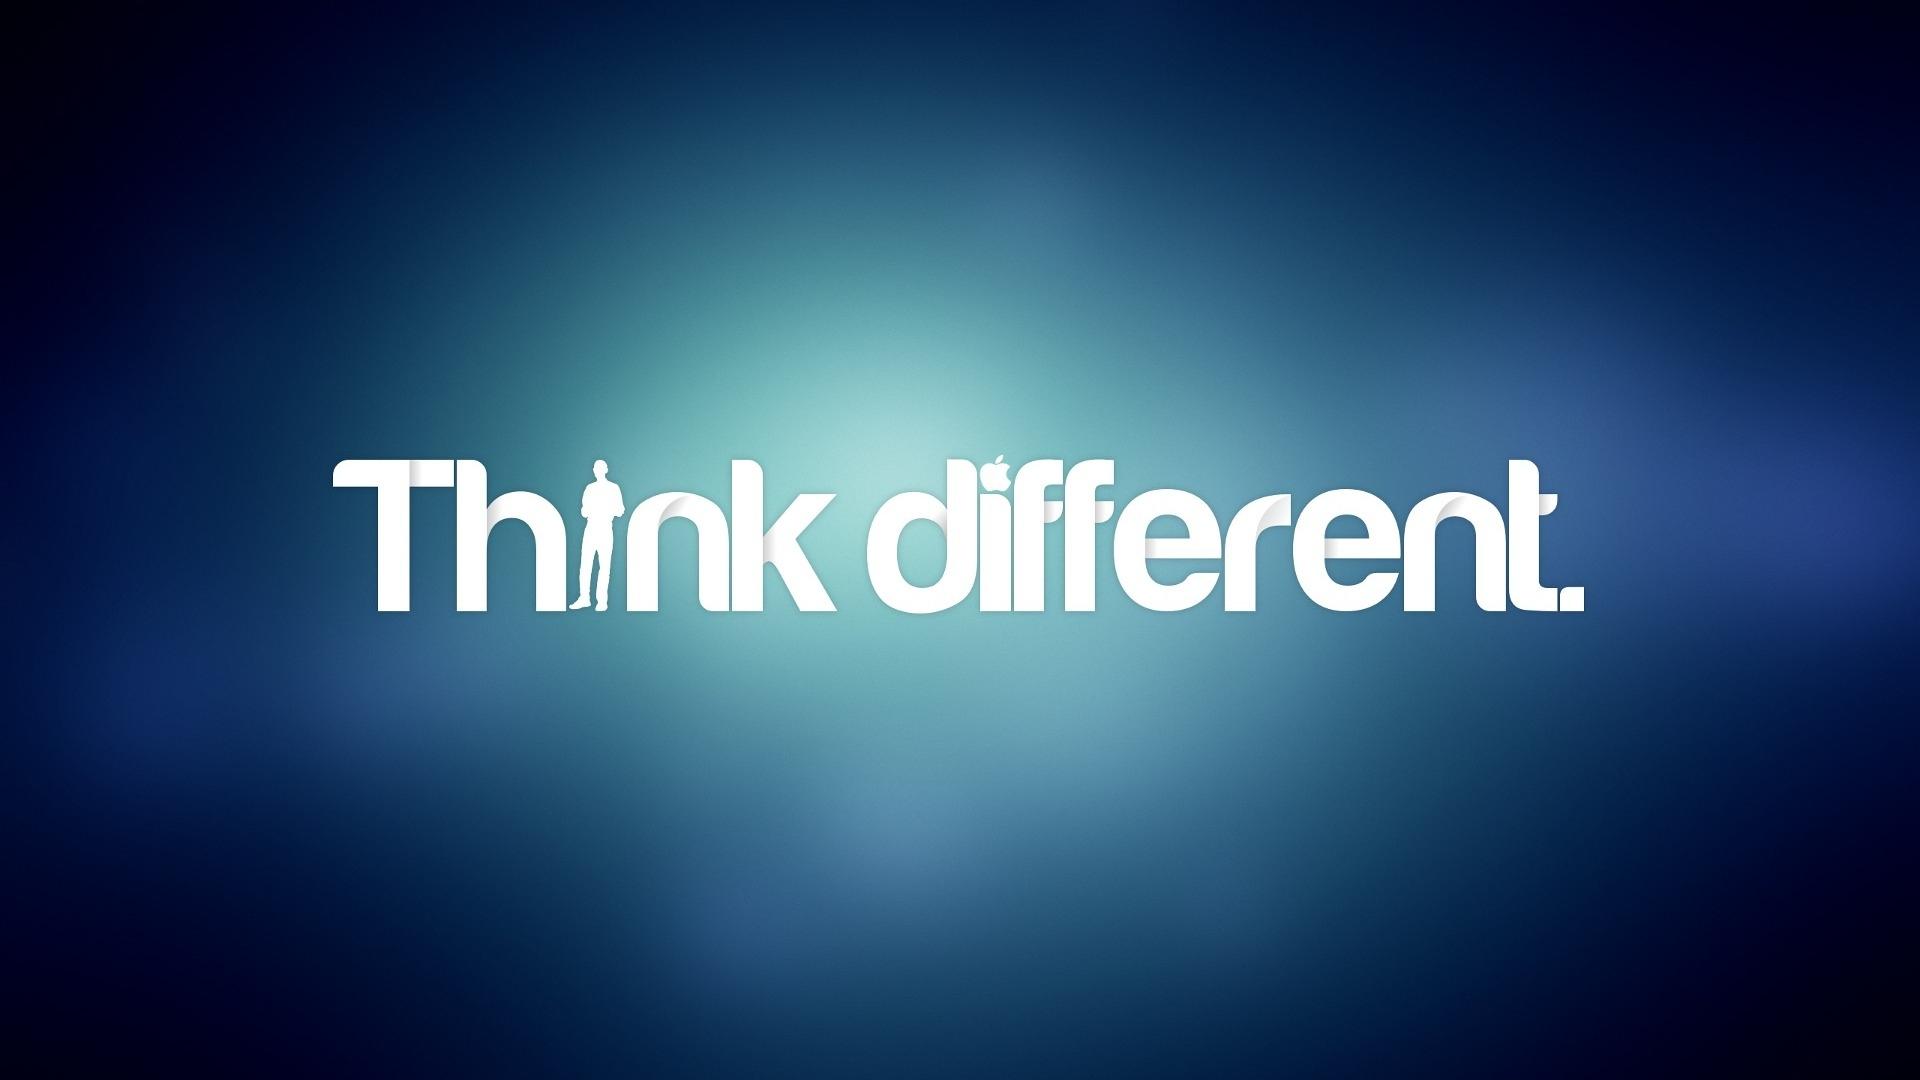 think different logo wallpaper 736006